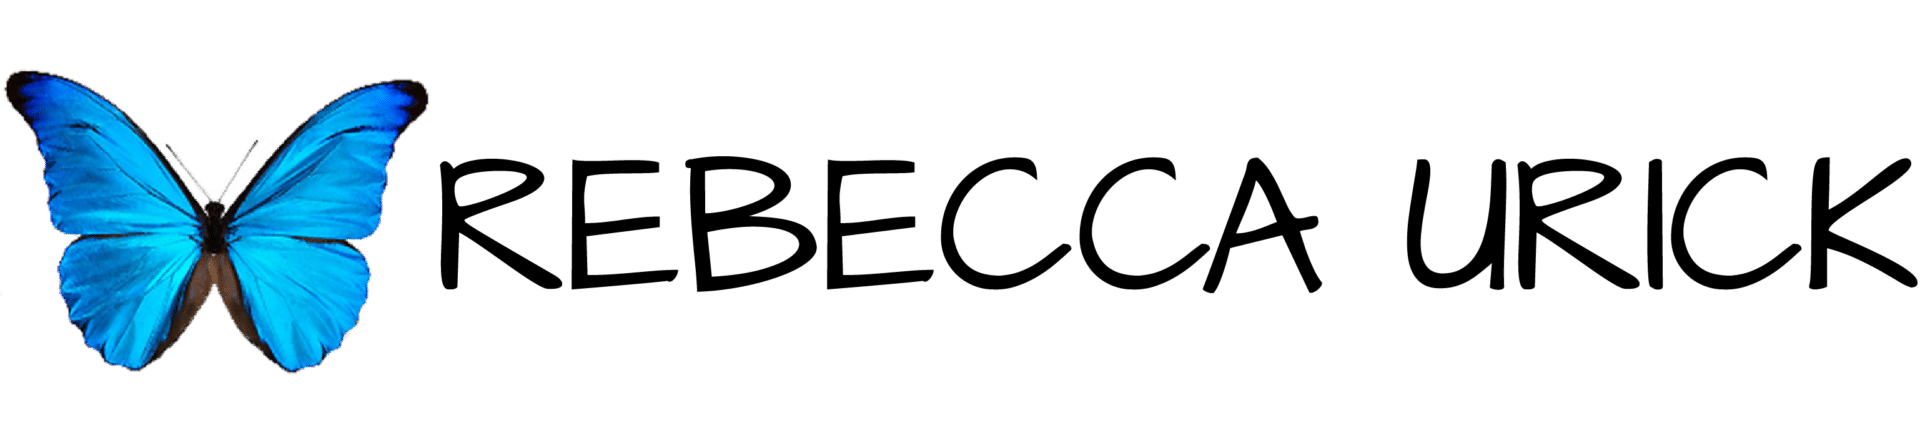 Rebecca Urick Horizontal Logo